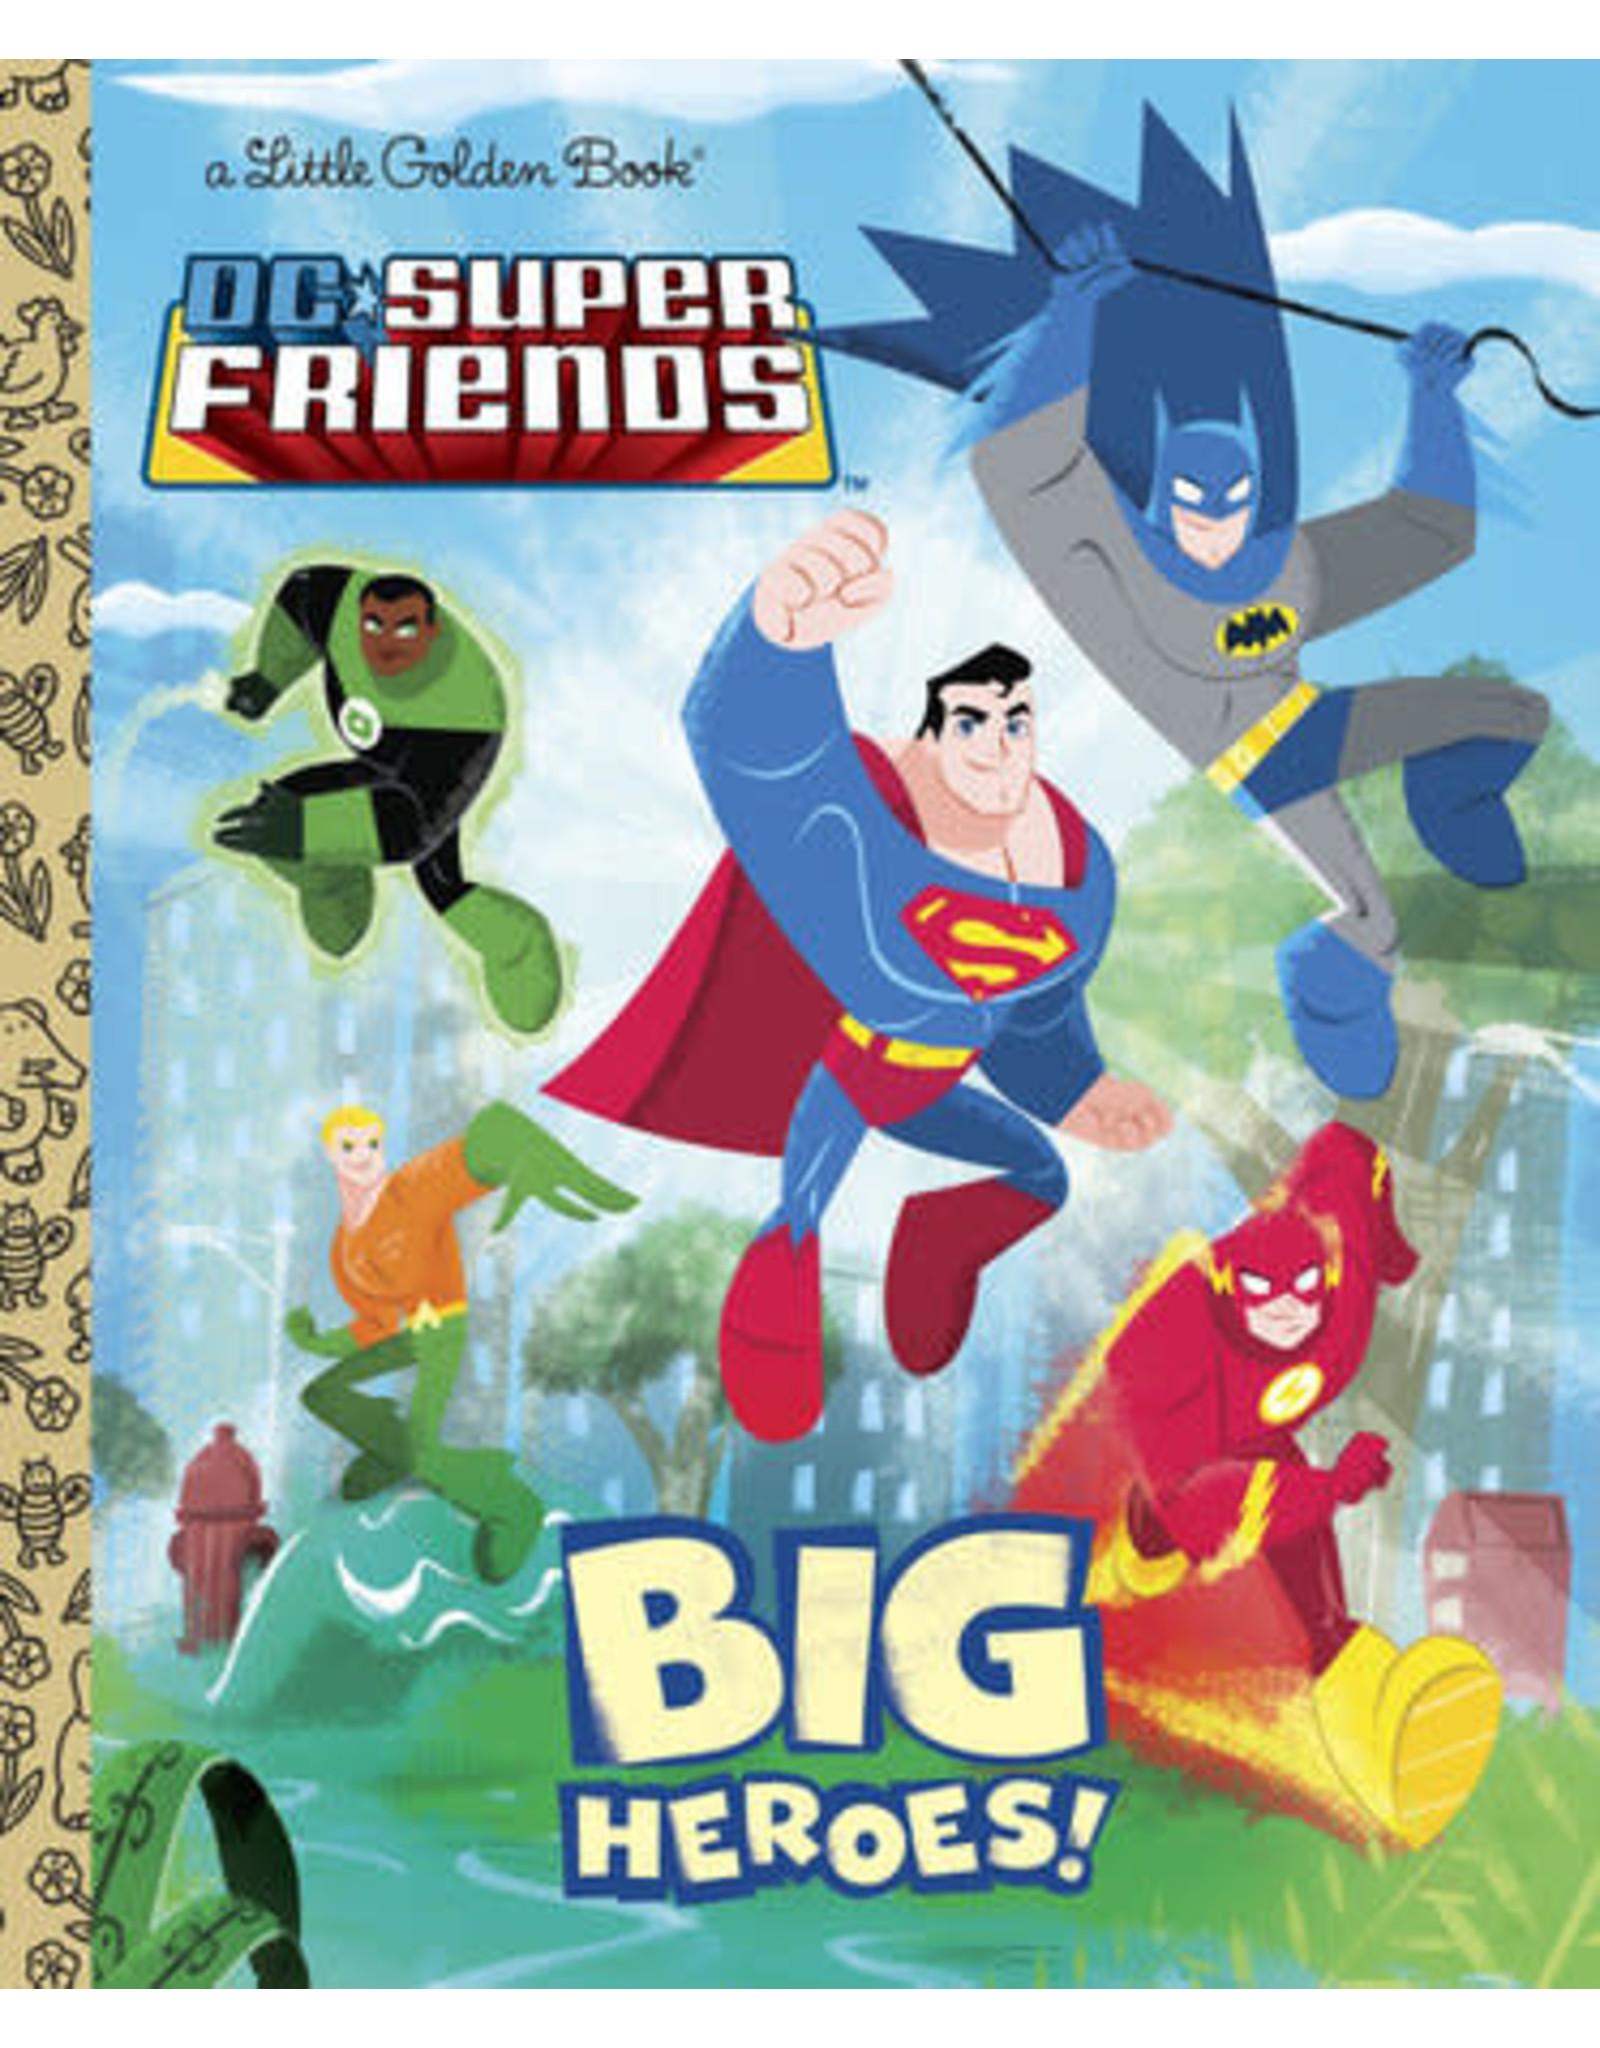 Little Golden Books Big Heroes! (DC Super Friends) - LGB